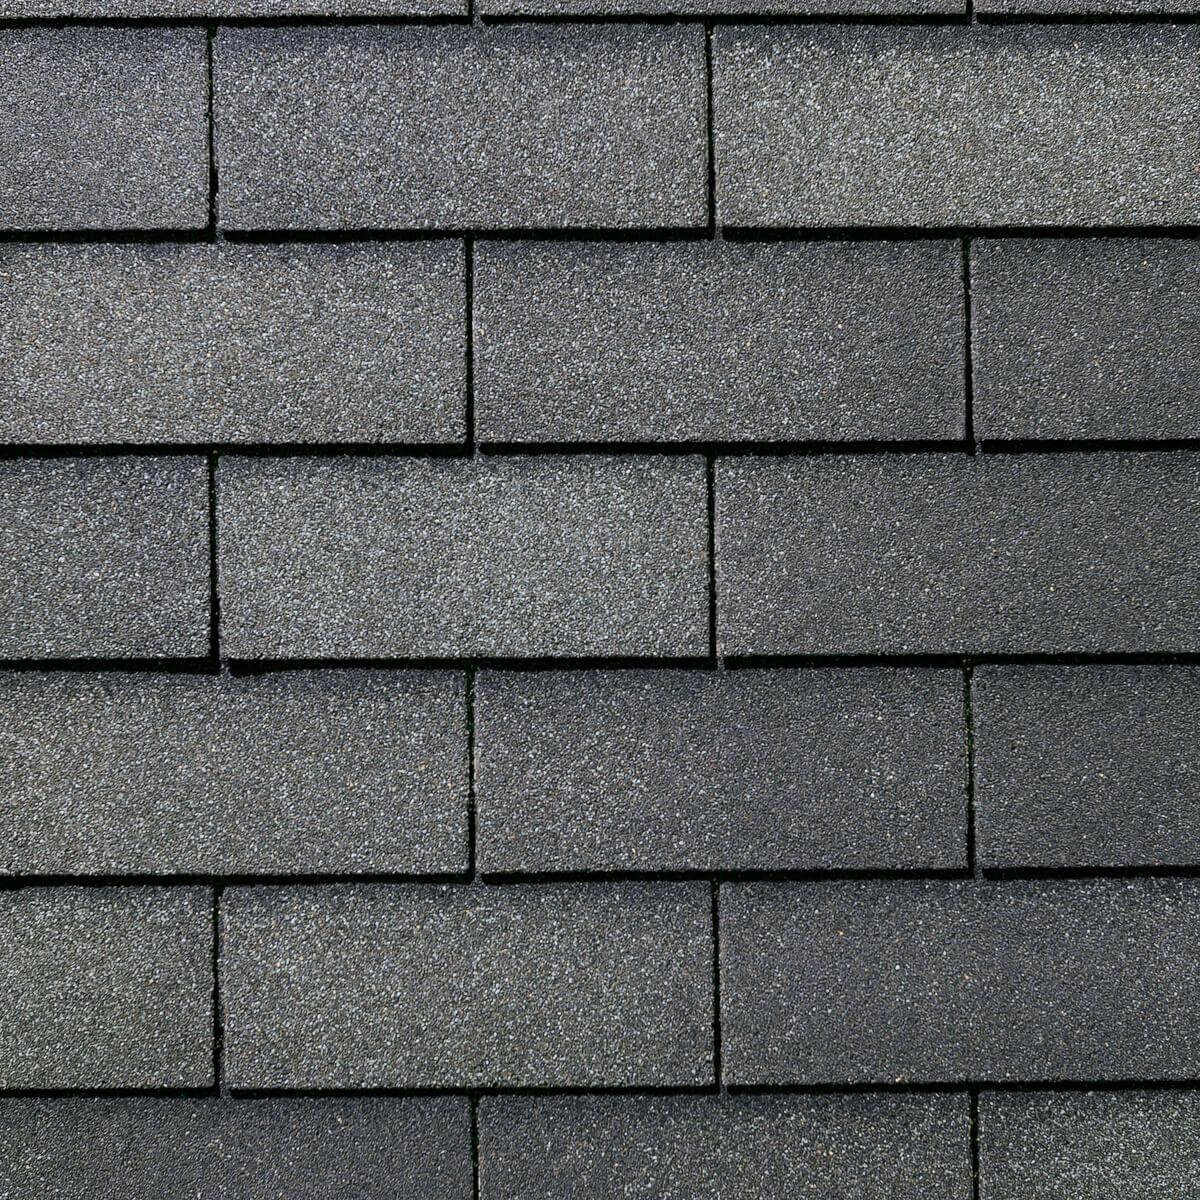 Yukon 3-tab Roofing Shingles - Twilight Grey